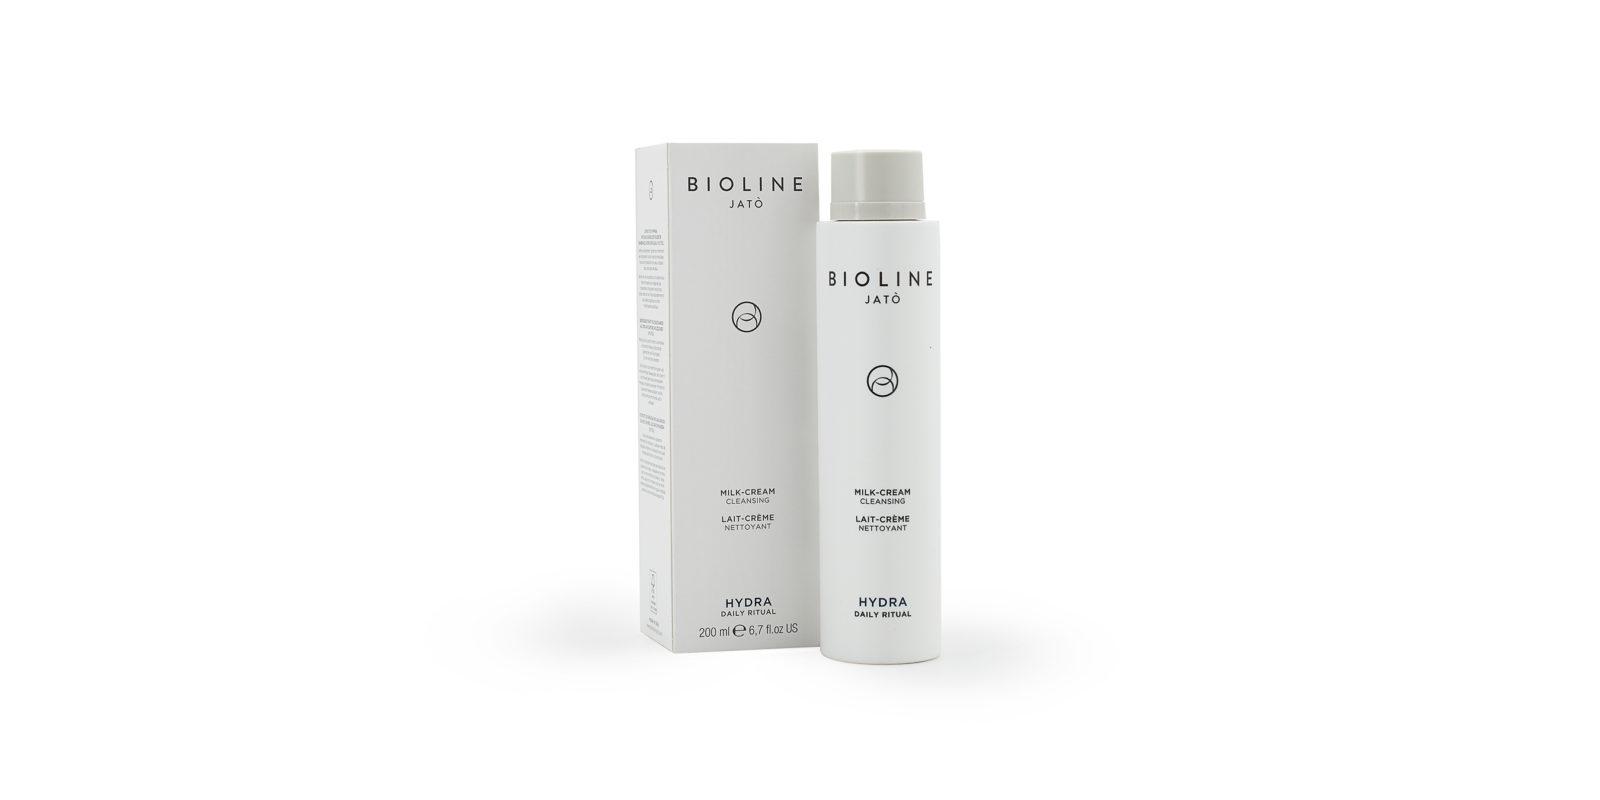 Bioline Jatò Pure+ Milk-Cream